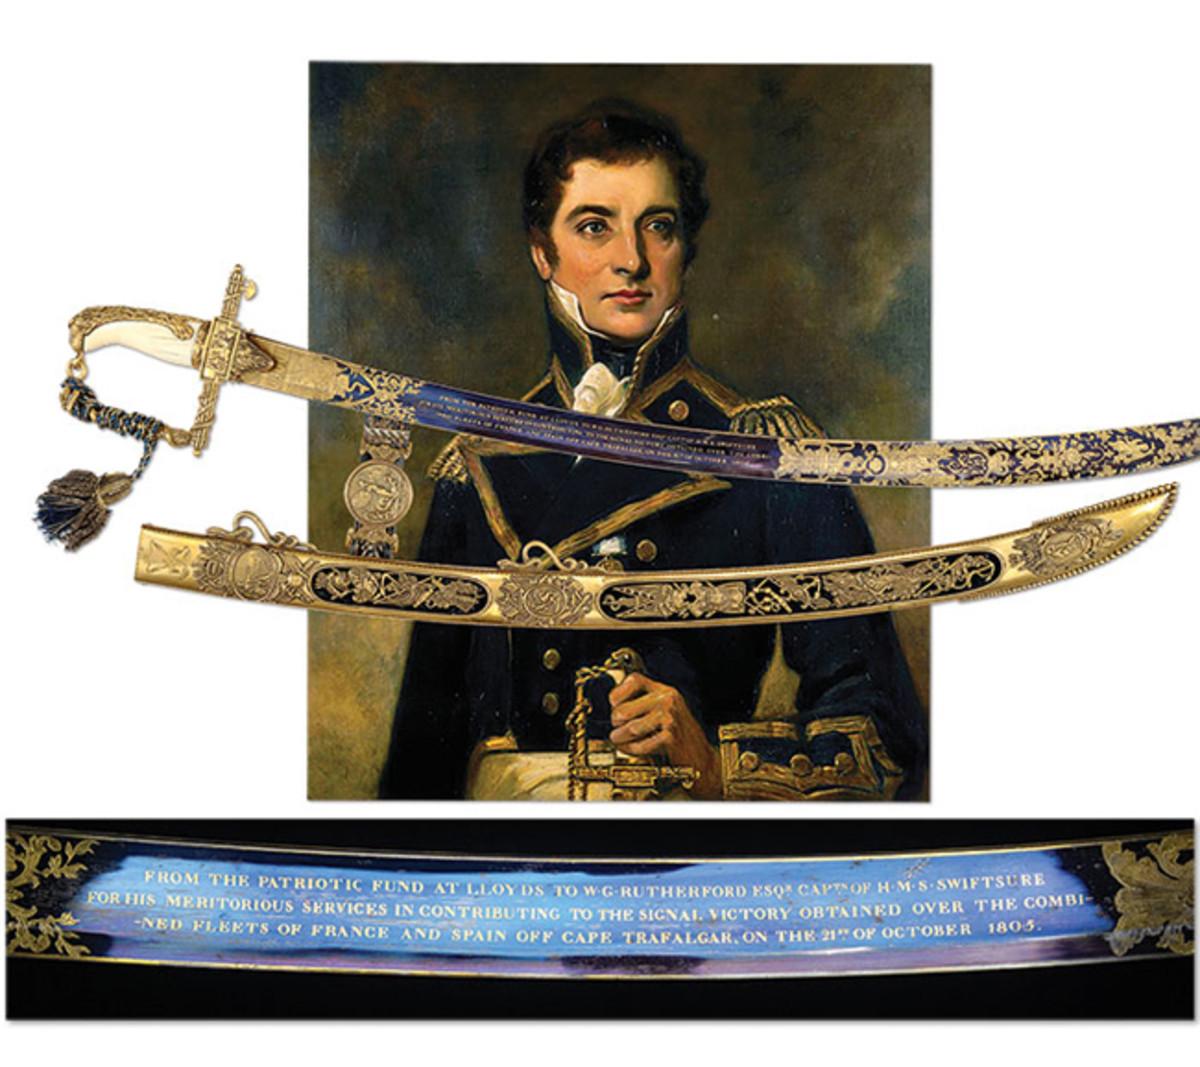 Cased 100 Guinea Lloyd's Patriotic Fund Presentation Sword for Hero Of Battle of Trafalgar